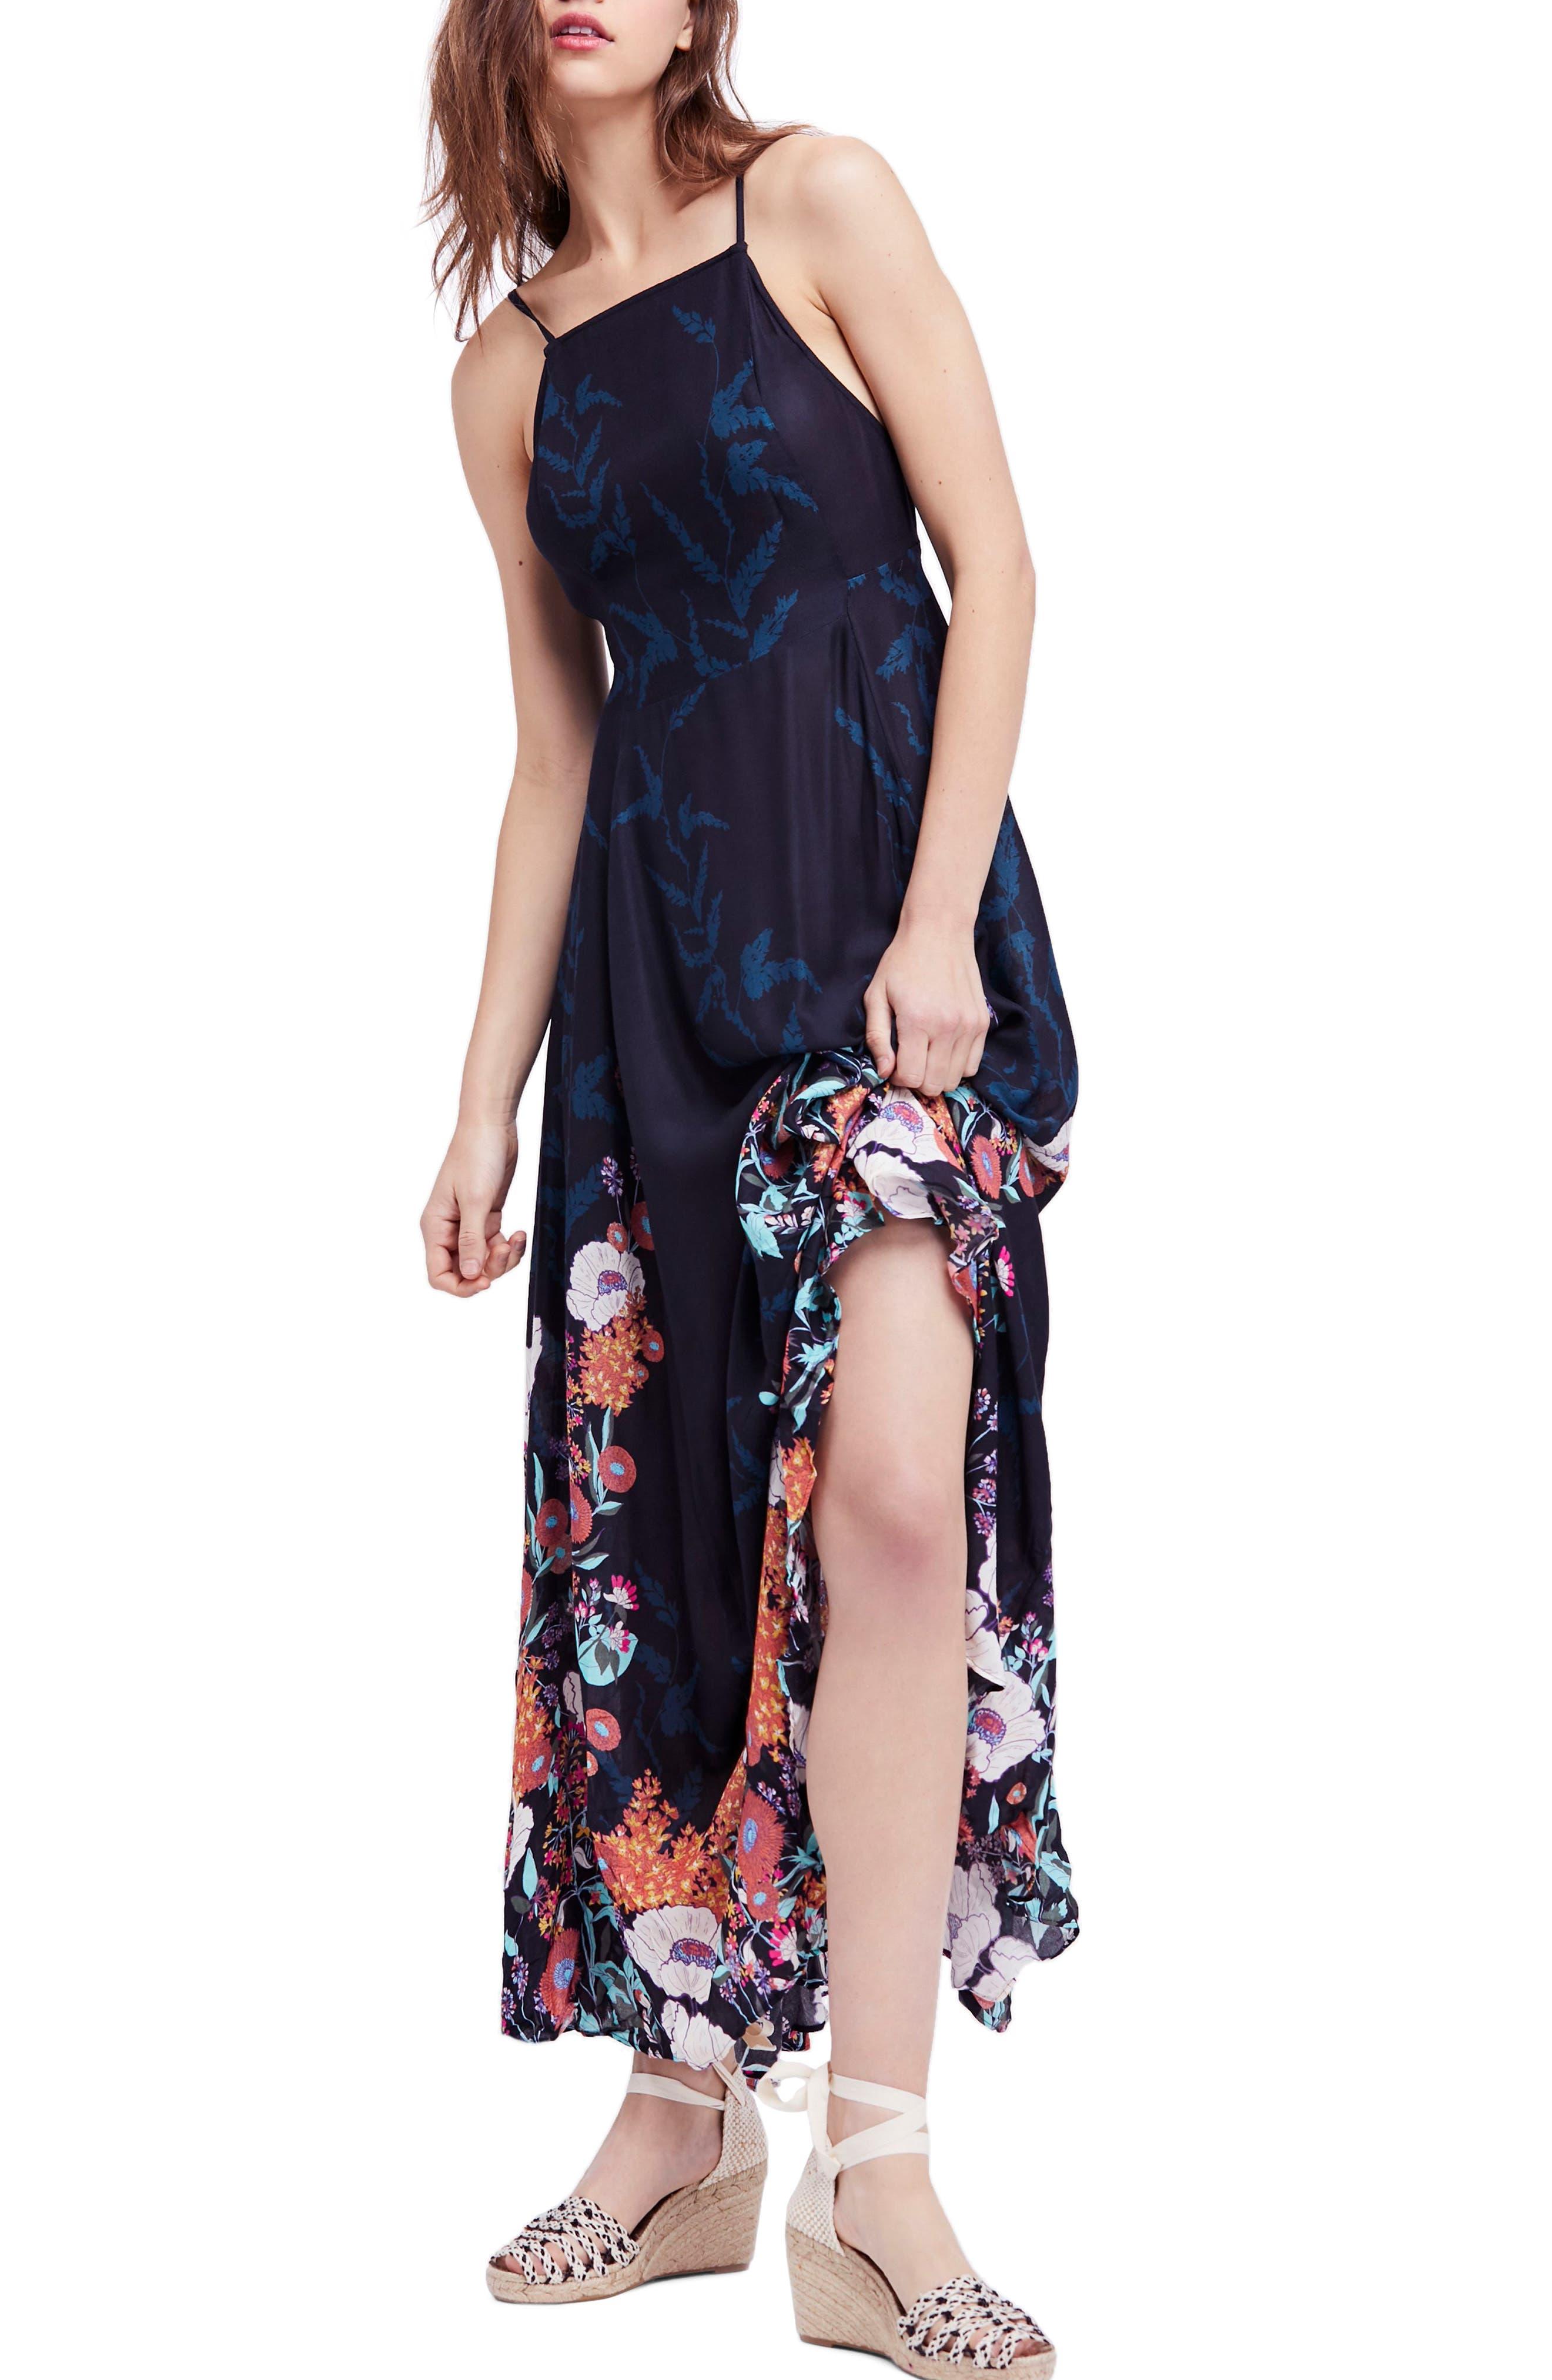 Embrace It Maxi Dress,                             Main thumbnail 1, color,                             019